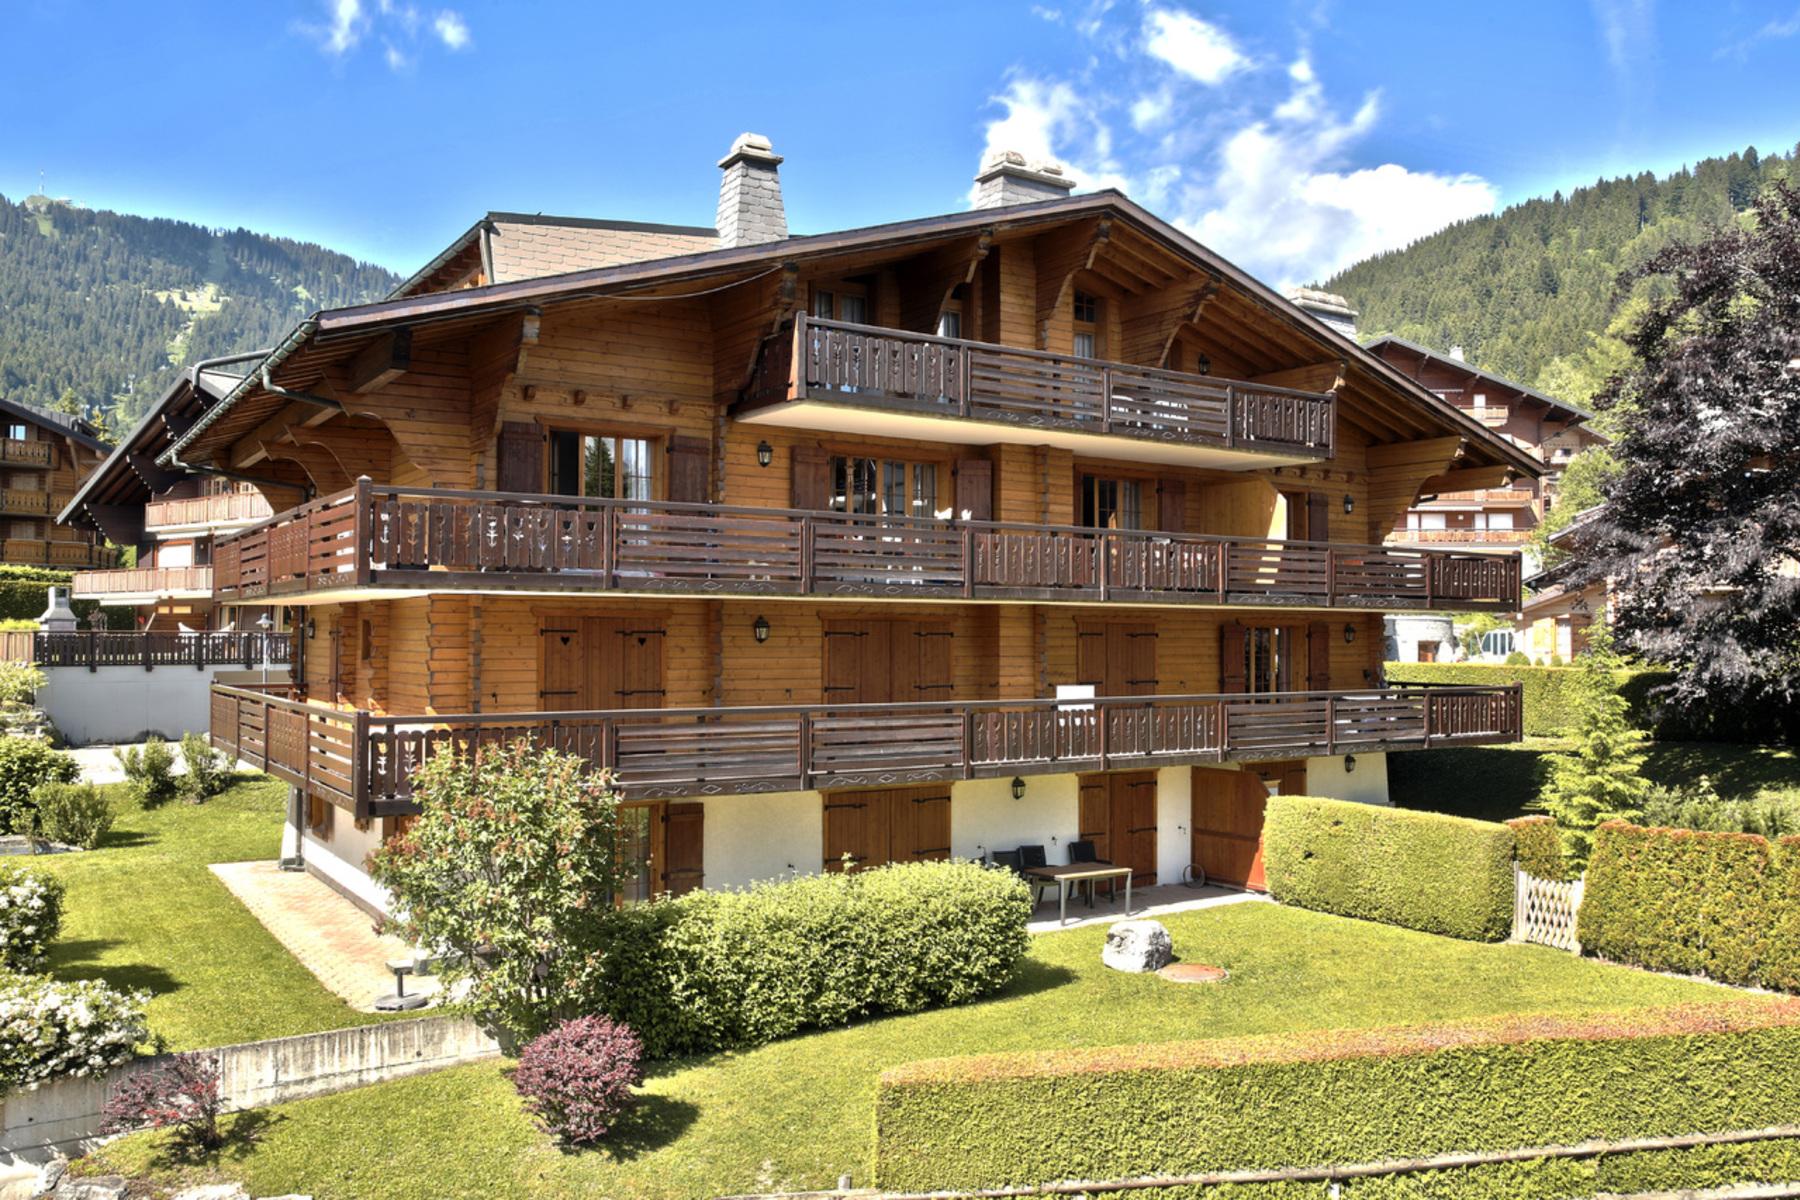 شقة للـ Sale في Impérial 3 Chemin des Troubadours 1 Villars-Sur-Ollon, Vaud, 1884 Switzerland